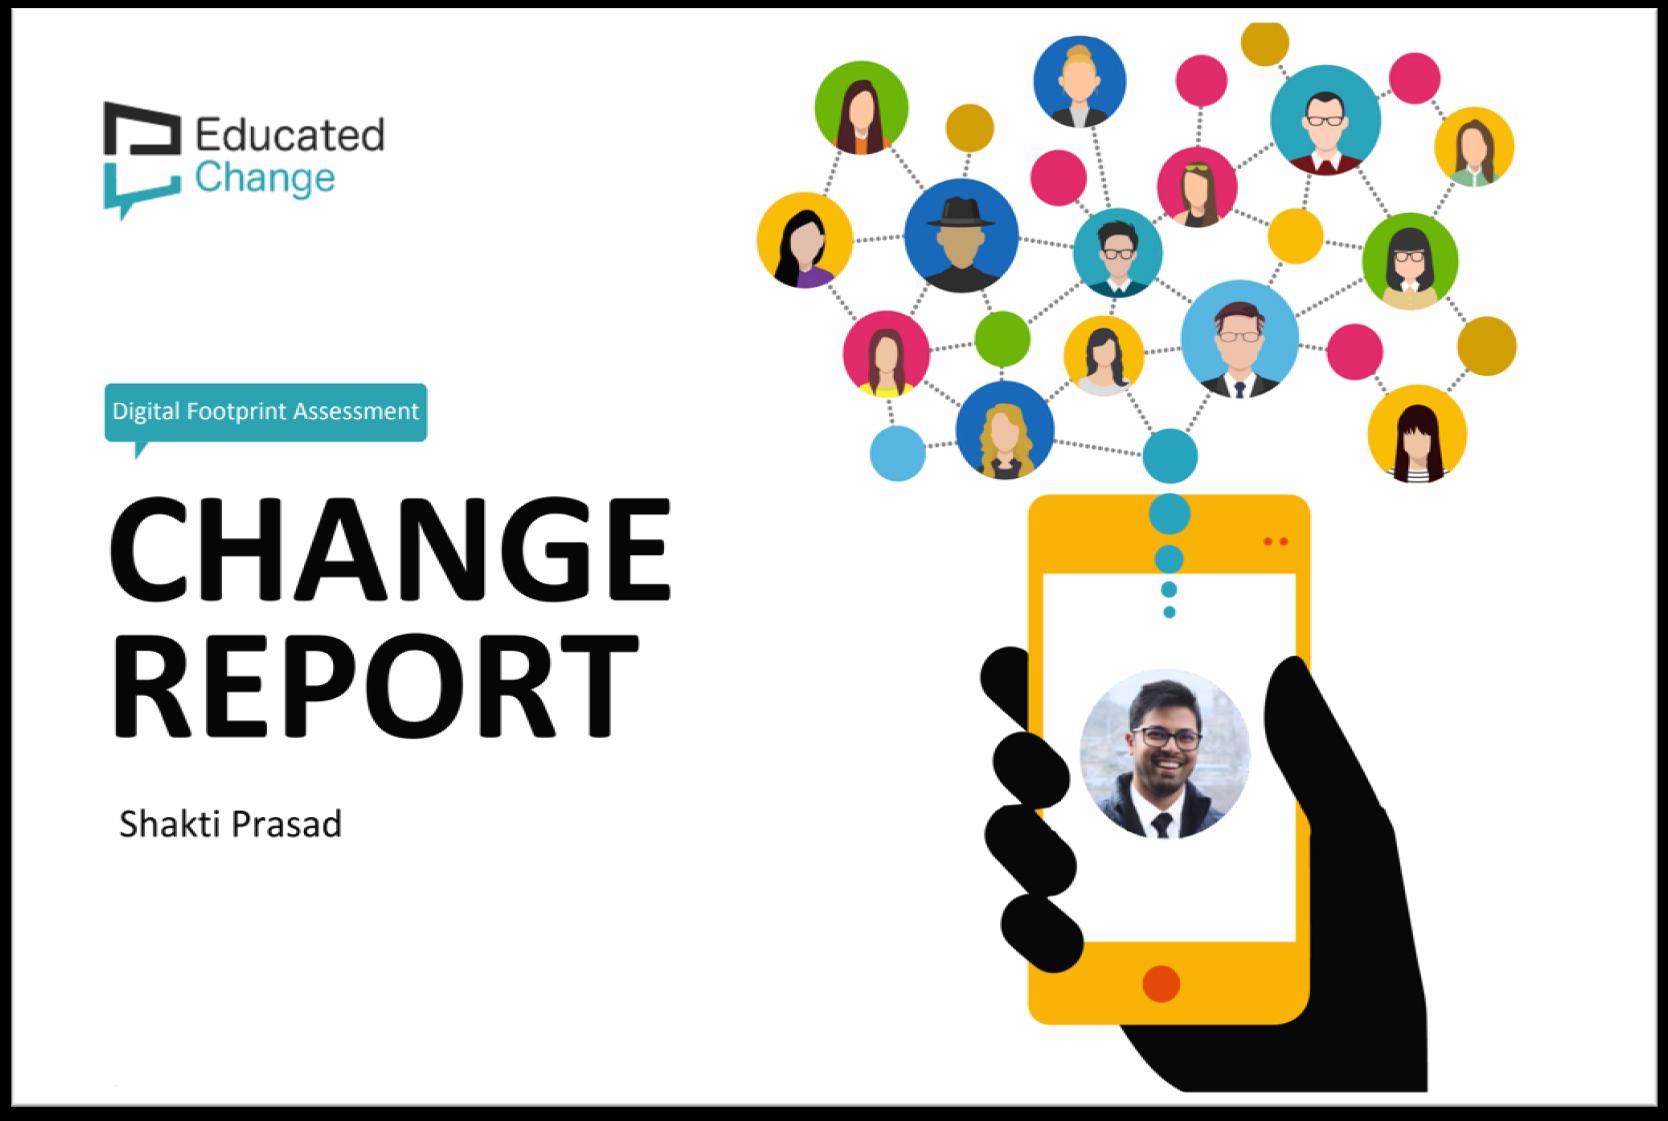 Educated-Change-Report-Digital-Footprint-Assessment